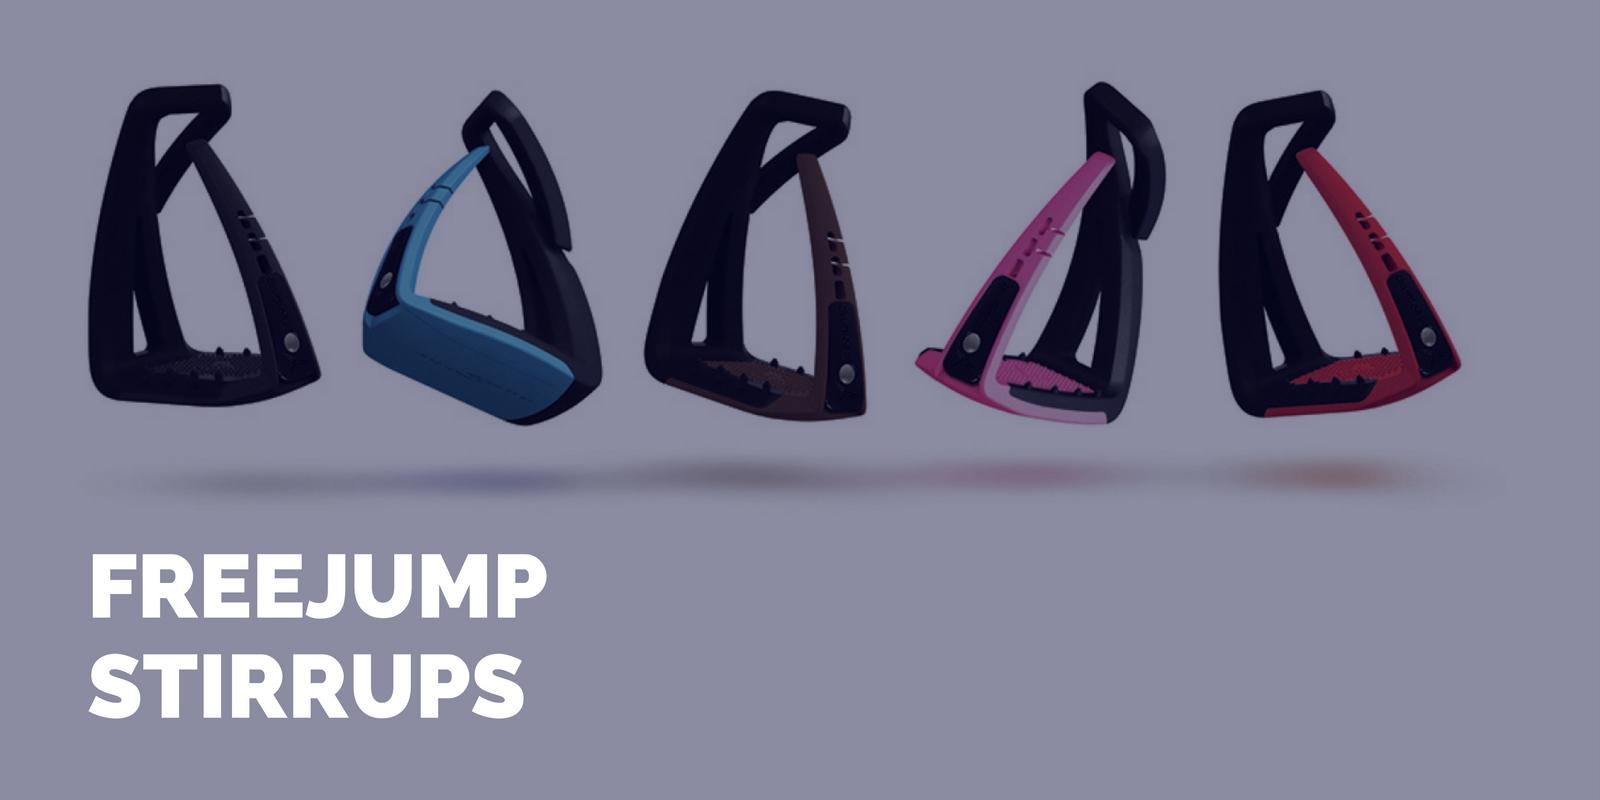 Freejump Stirrups